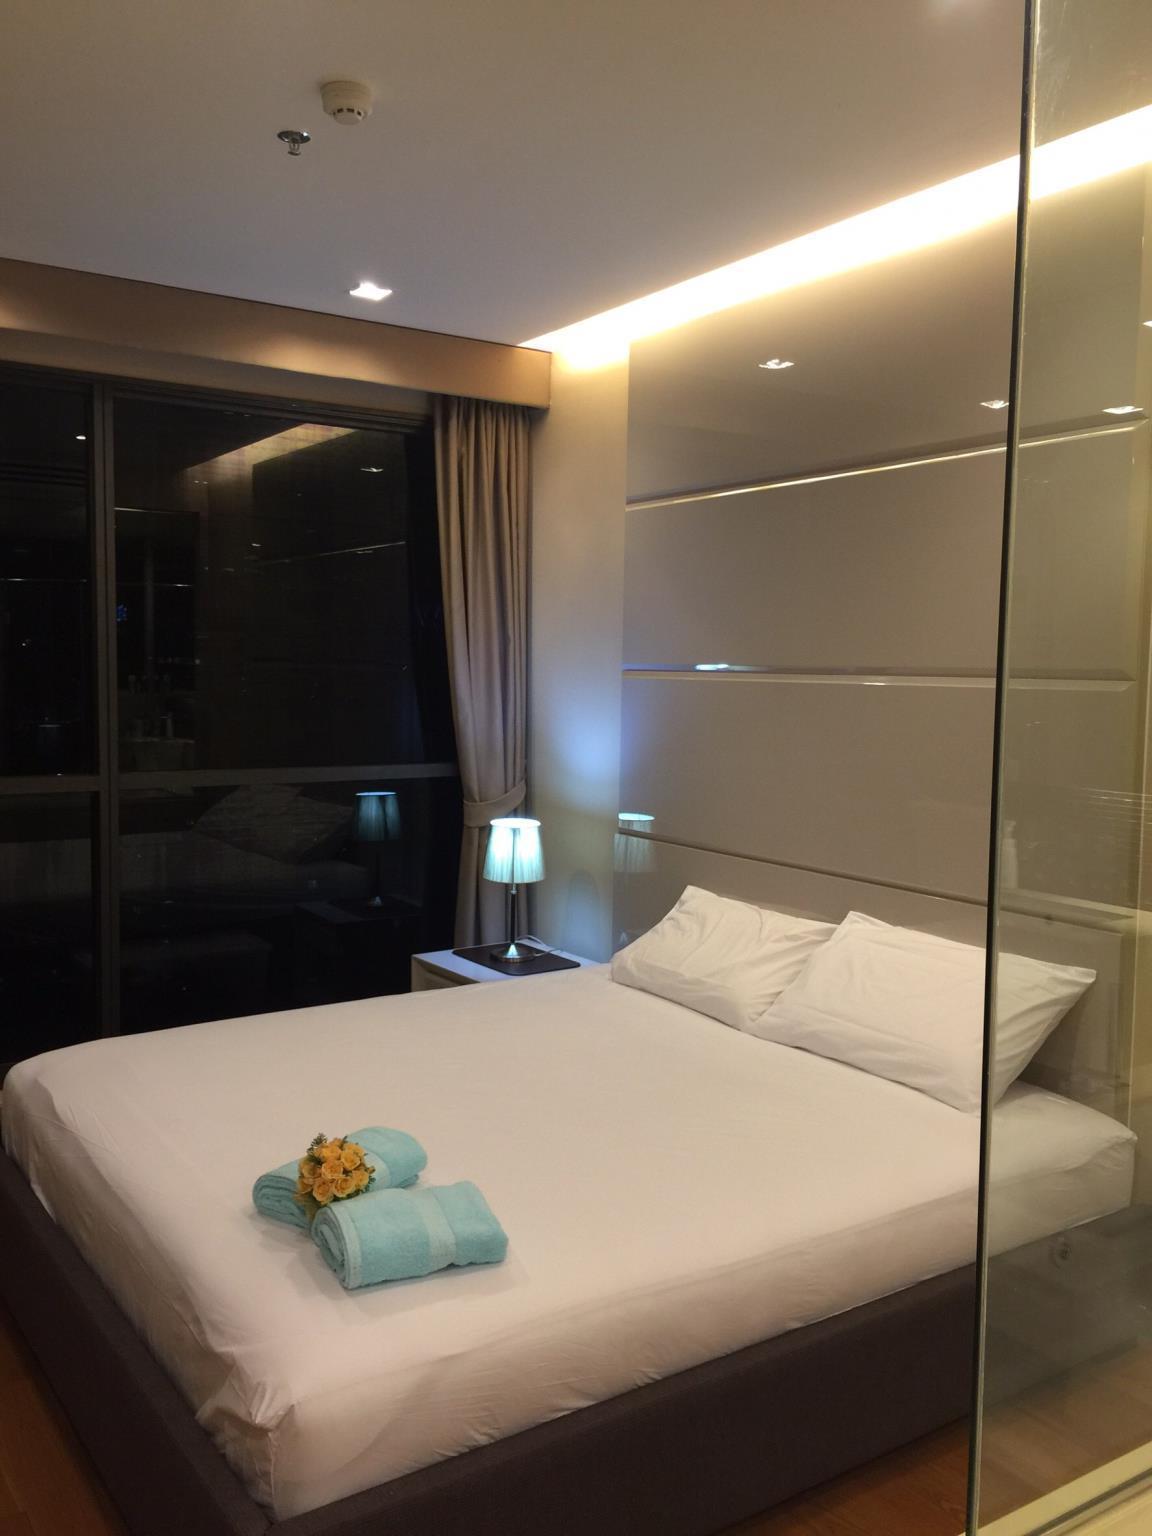 Luxury 2BDs 2Mins BTS @Heart of Bangkok Luxury 2BDs 2Mins BTS @Heart of Bangkok